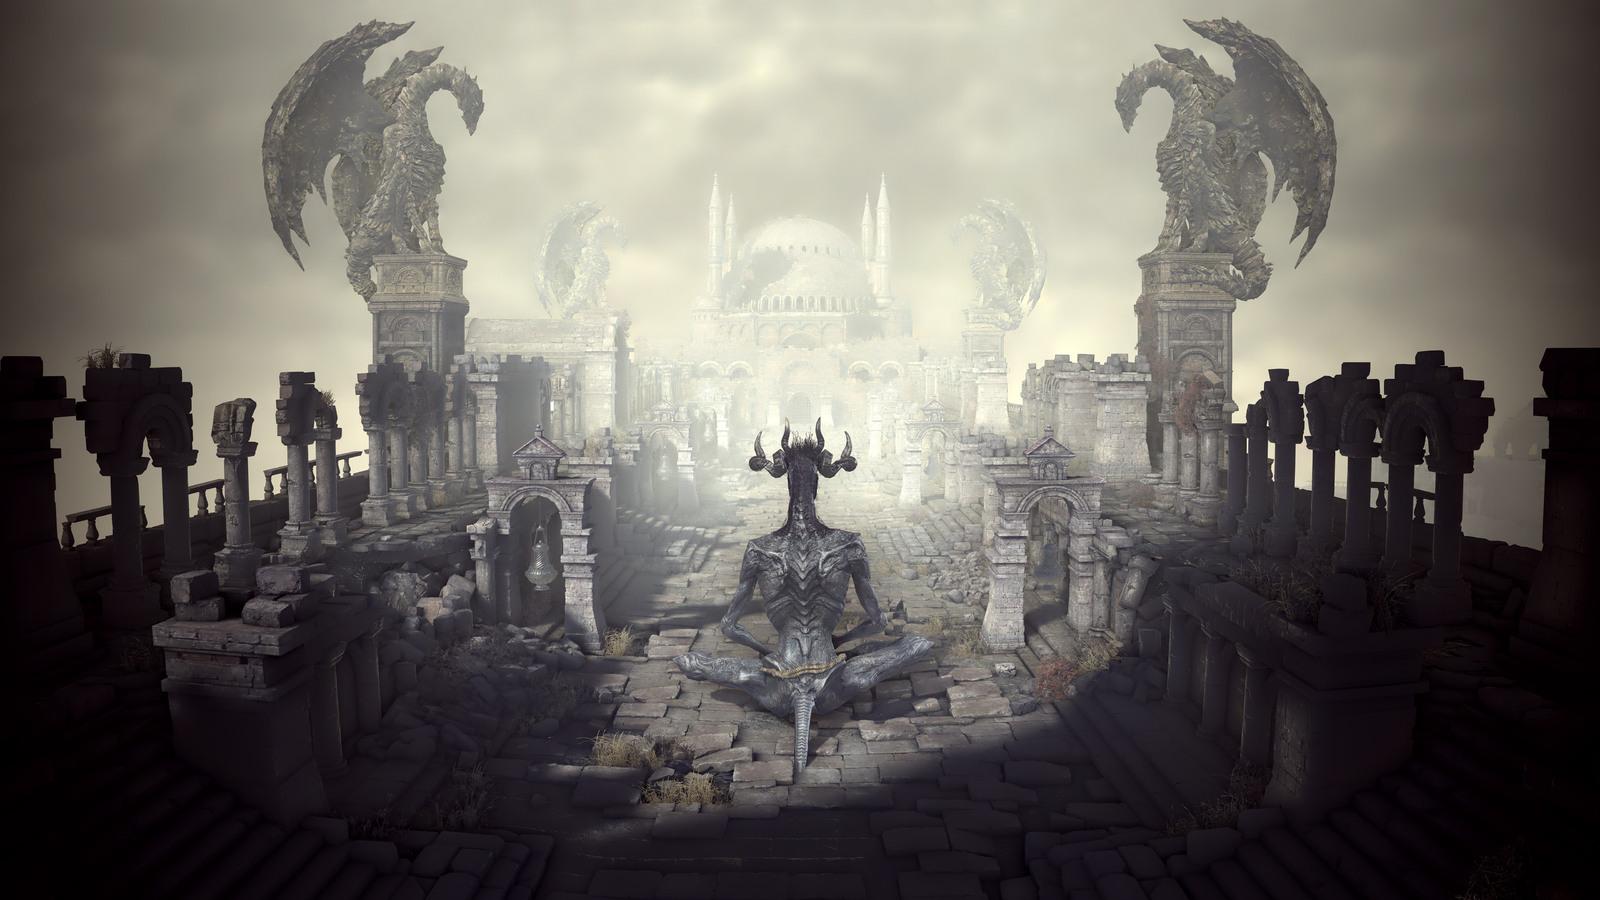 1600x900 dark souls 3 demon 1600x900 resolution hd 4k wallpapers